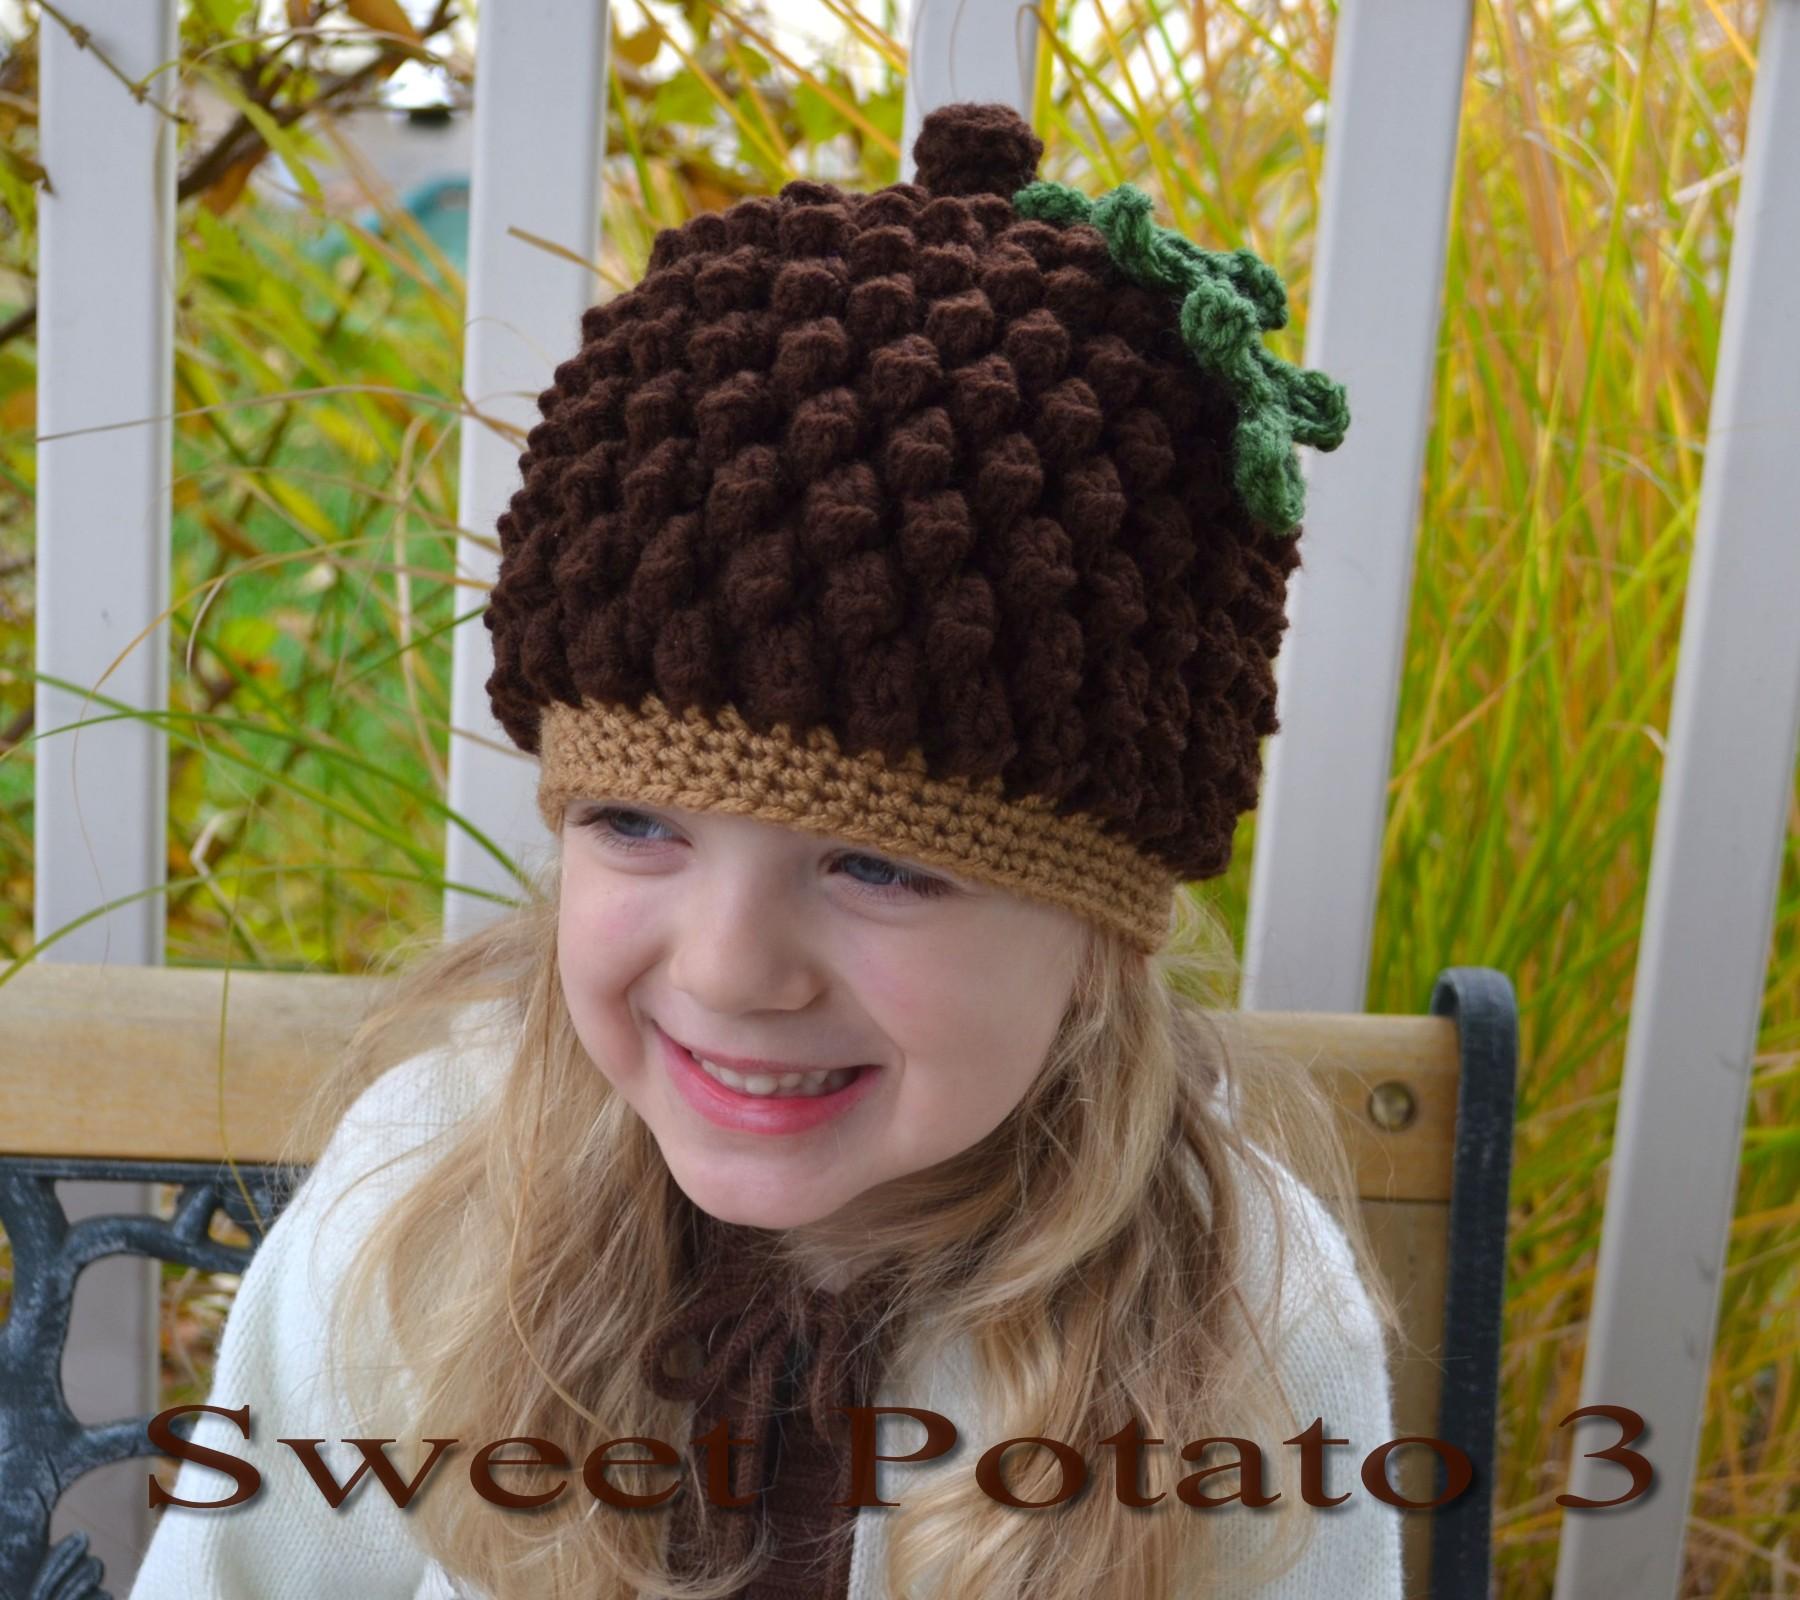 Adult Hats Archives - Sweet Potato 3